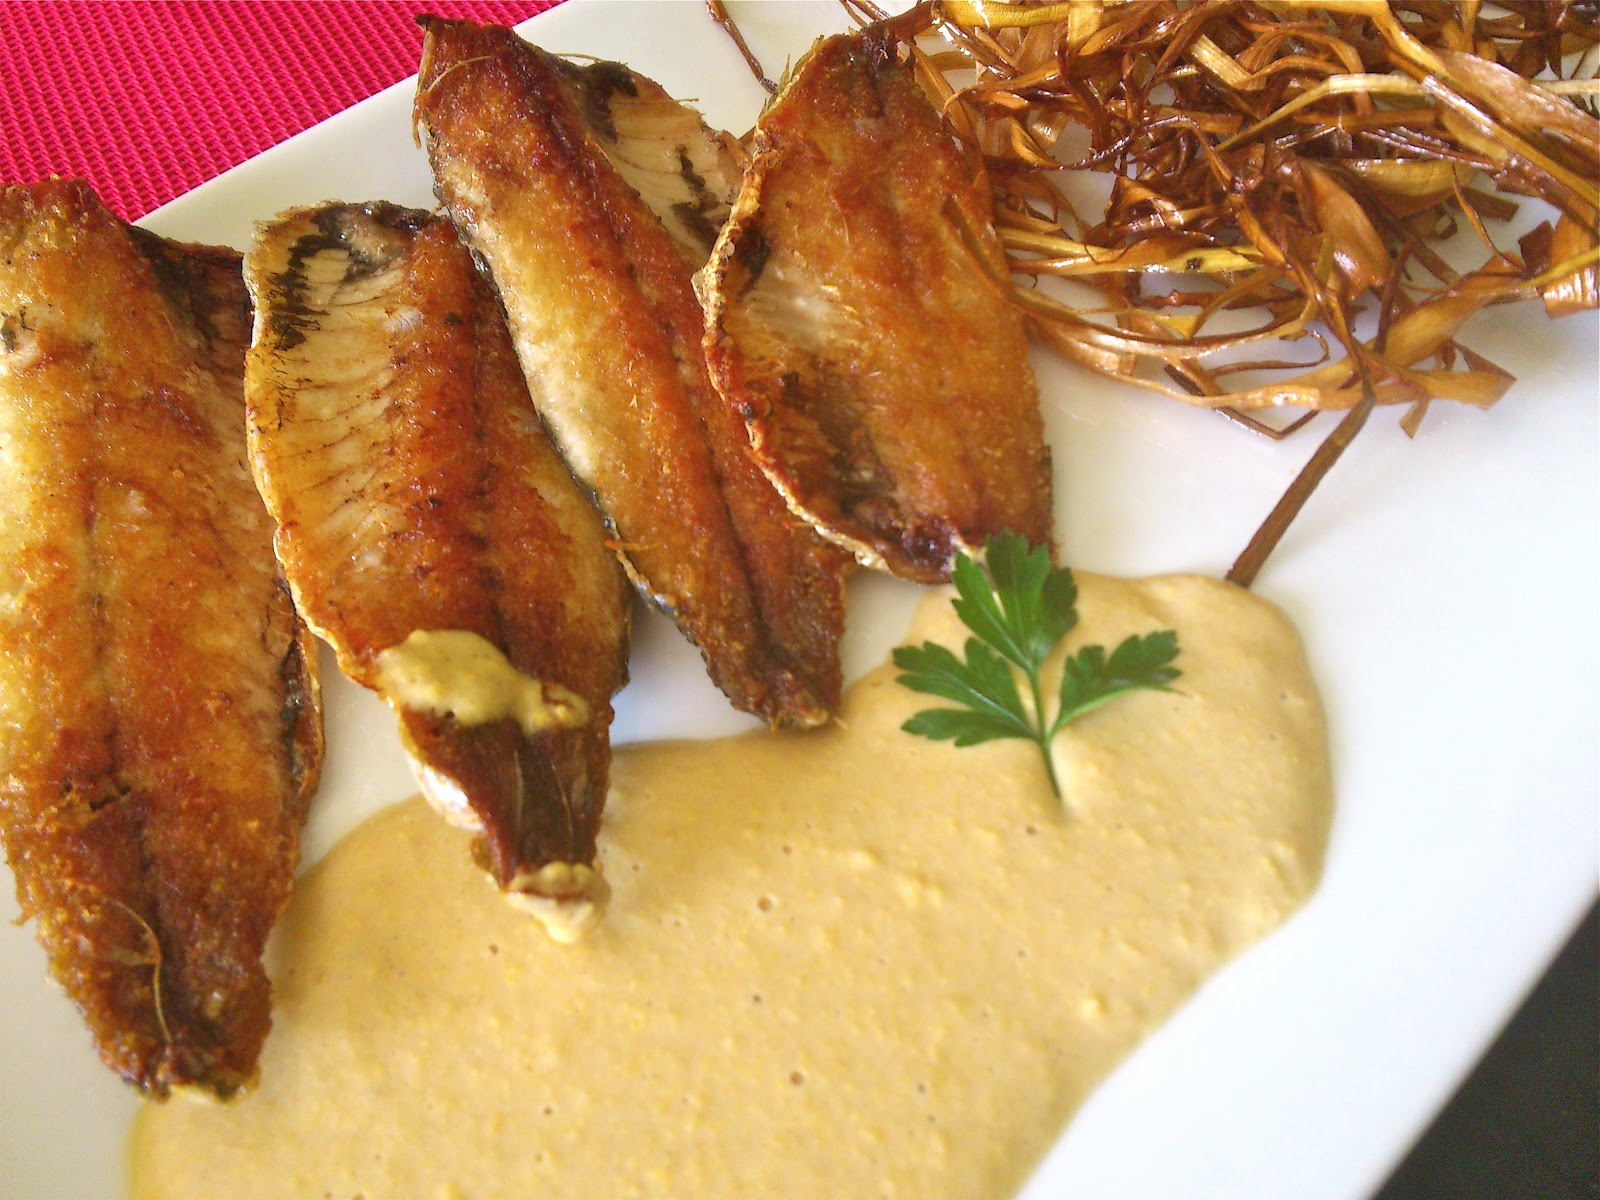 Cocinan 2 sardinas a la plancha con salsa de mostaza - Como cocinar sardinas ...